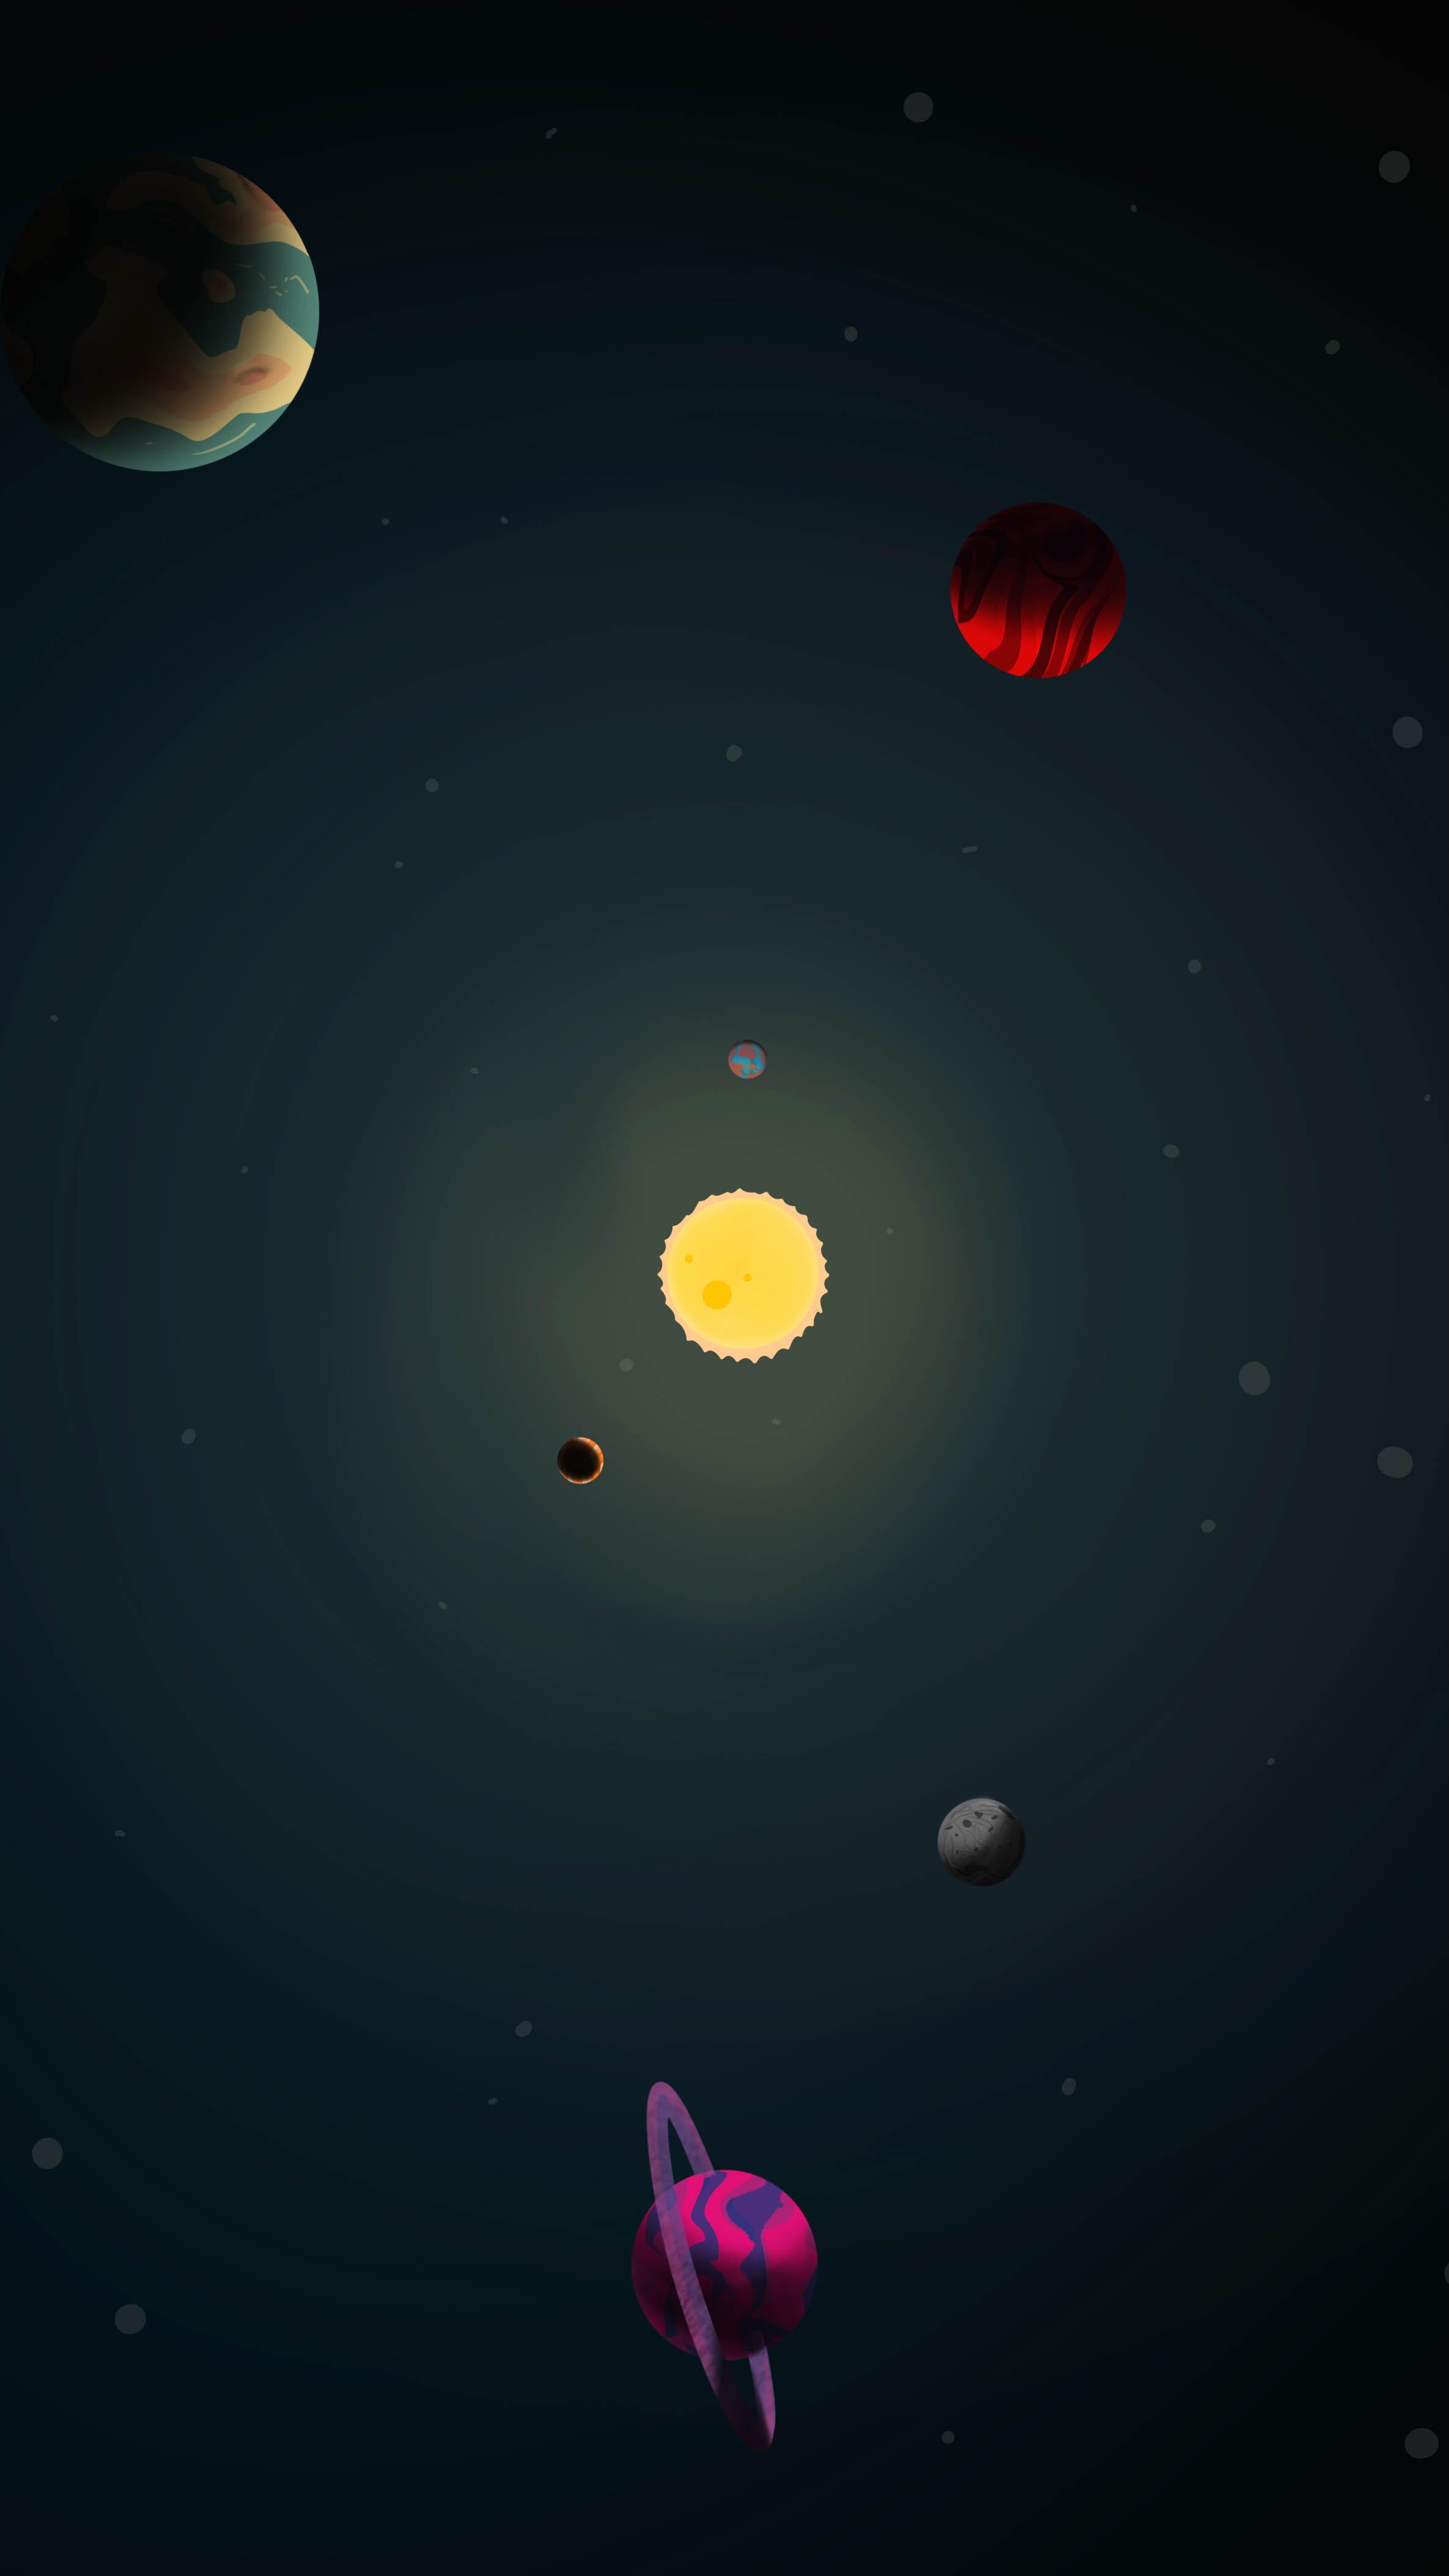 Solar System Art iPhone Wallpaper